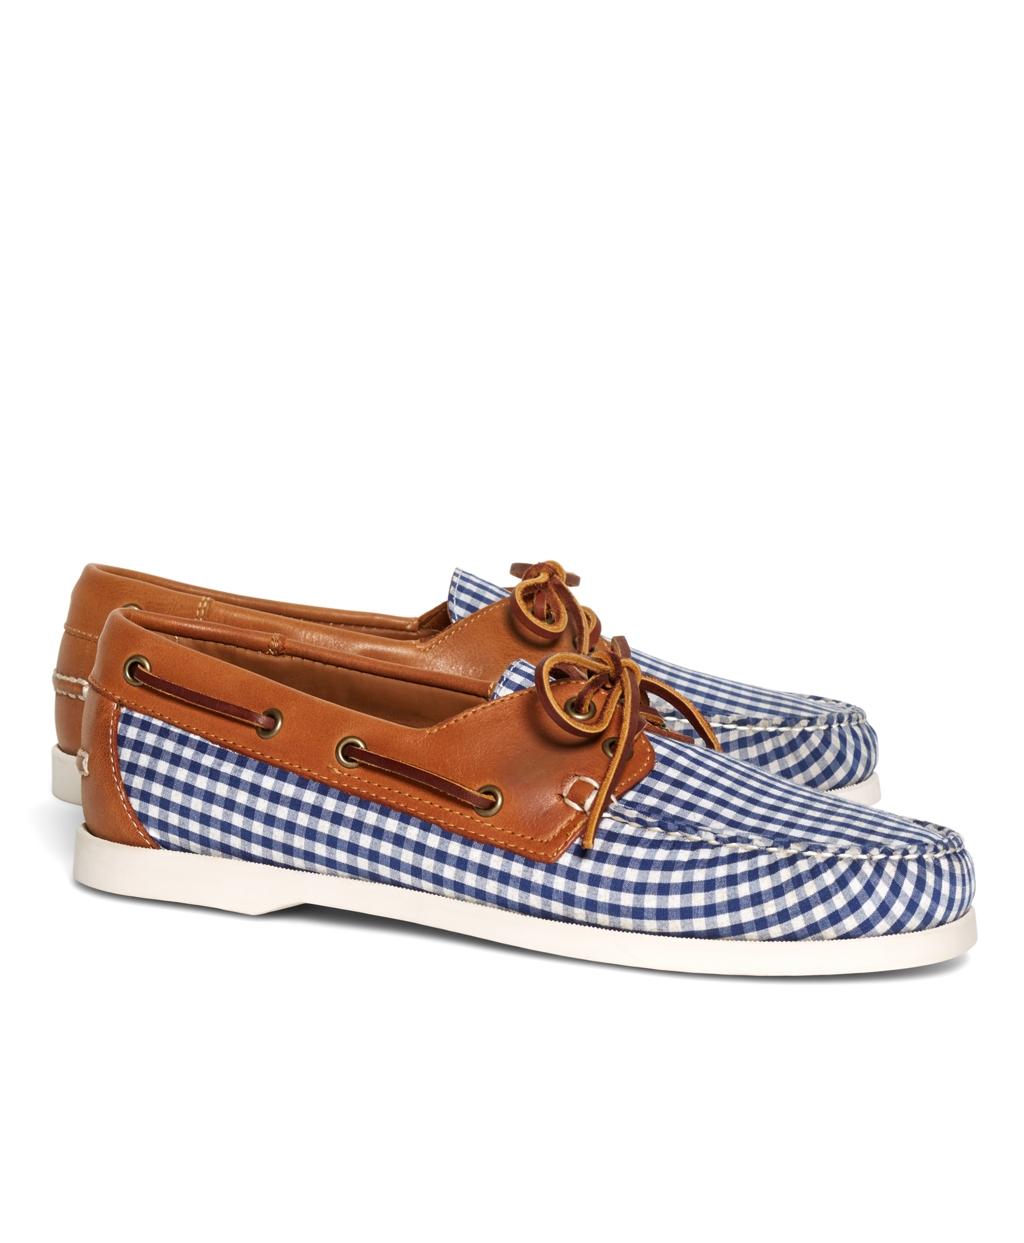 Asos Black Boat Shoes